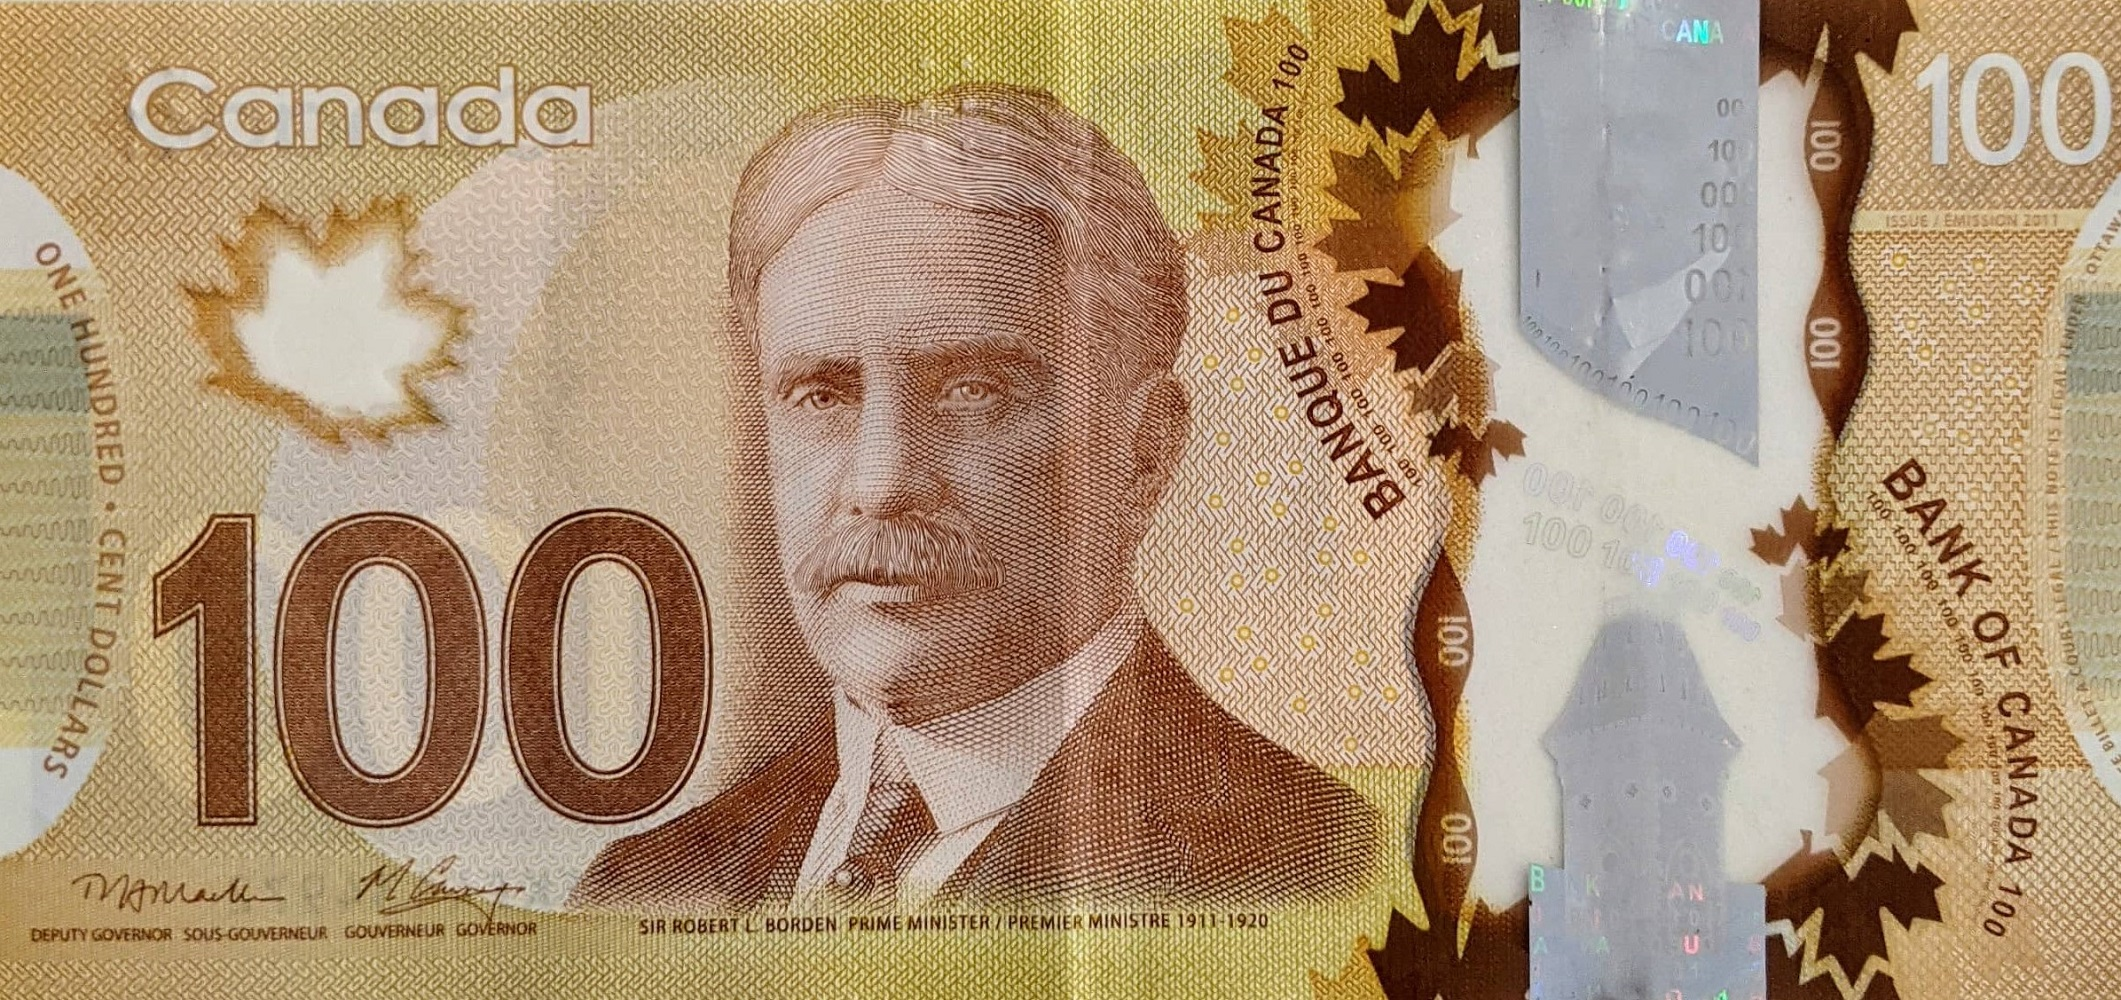 Canadian one hundred bill